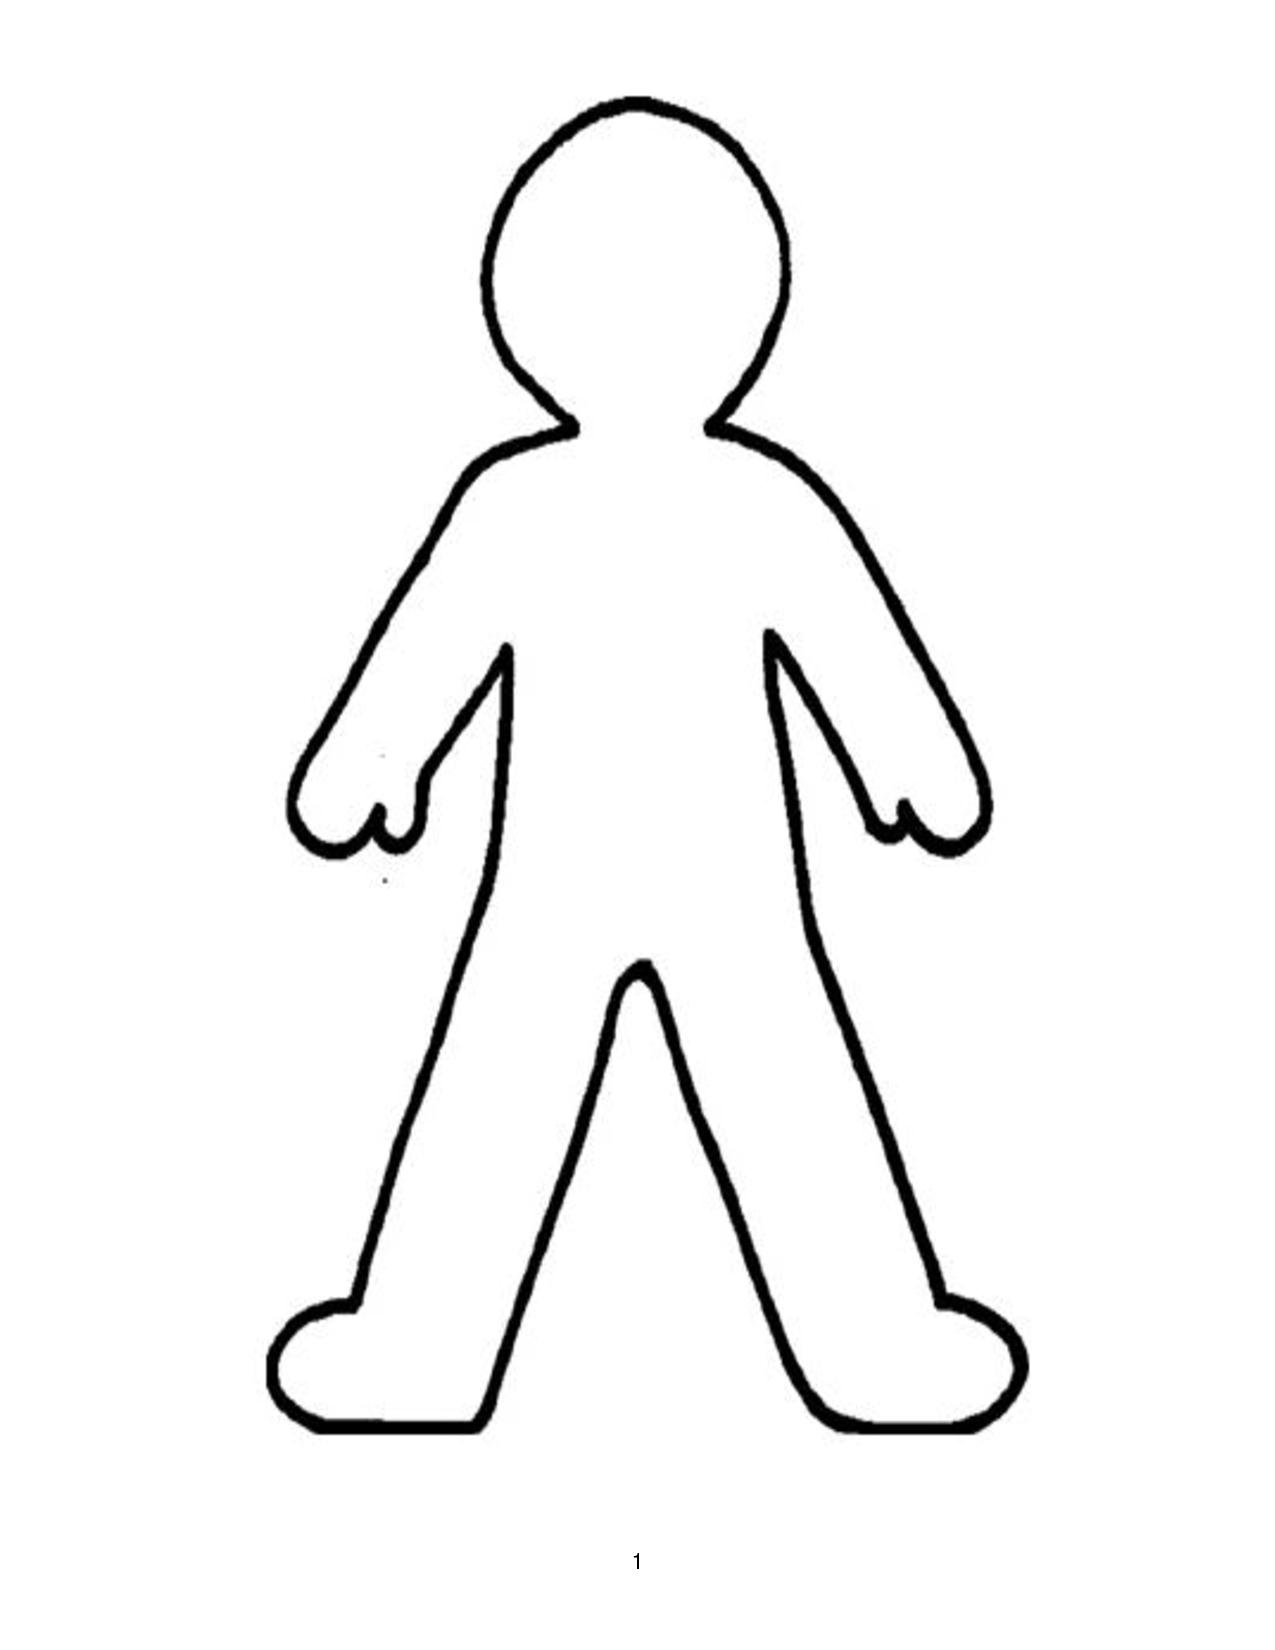 Dead Body Outline Clip Art Cliparts Co-Dead Body Outline Clip Art Cliparts Co-12